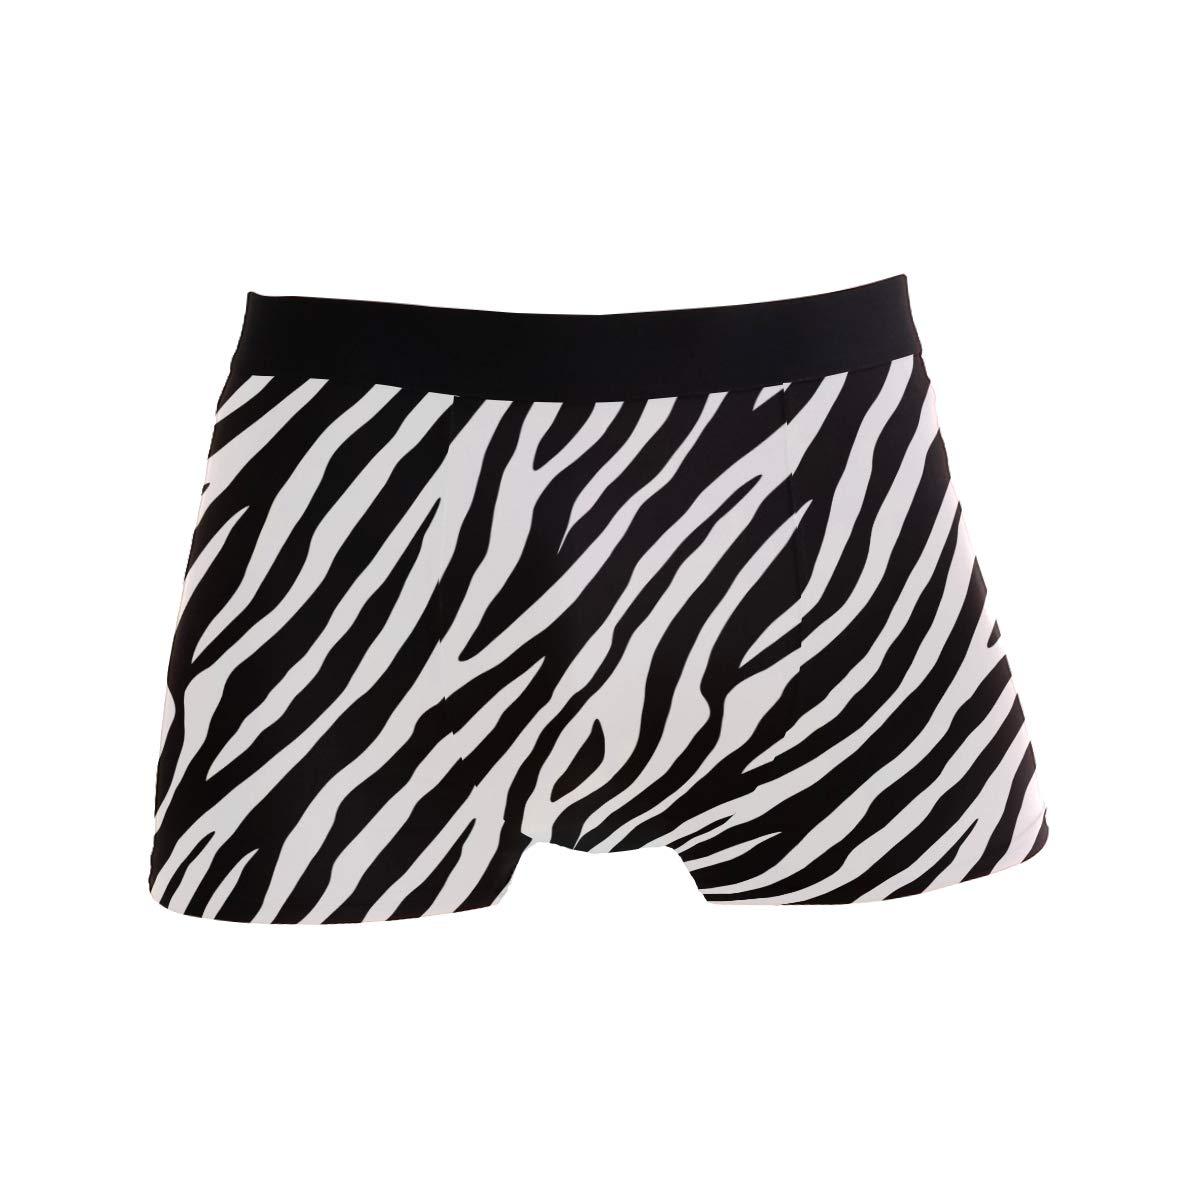 ZZKKO Black and White Zebra Print Mens Boxer Briefs Underwear Breathable Stretch Boxer Trunk with Pouch S-XL